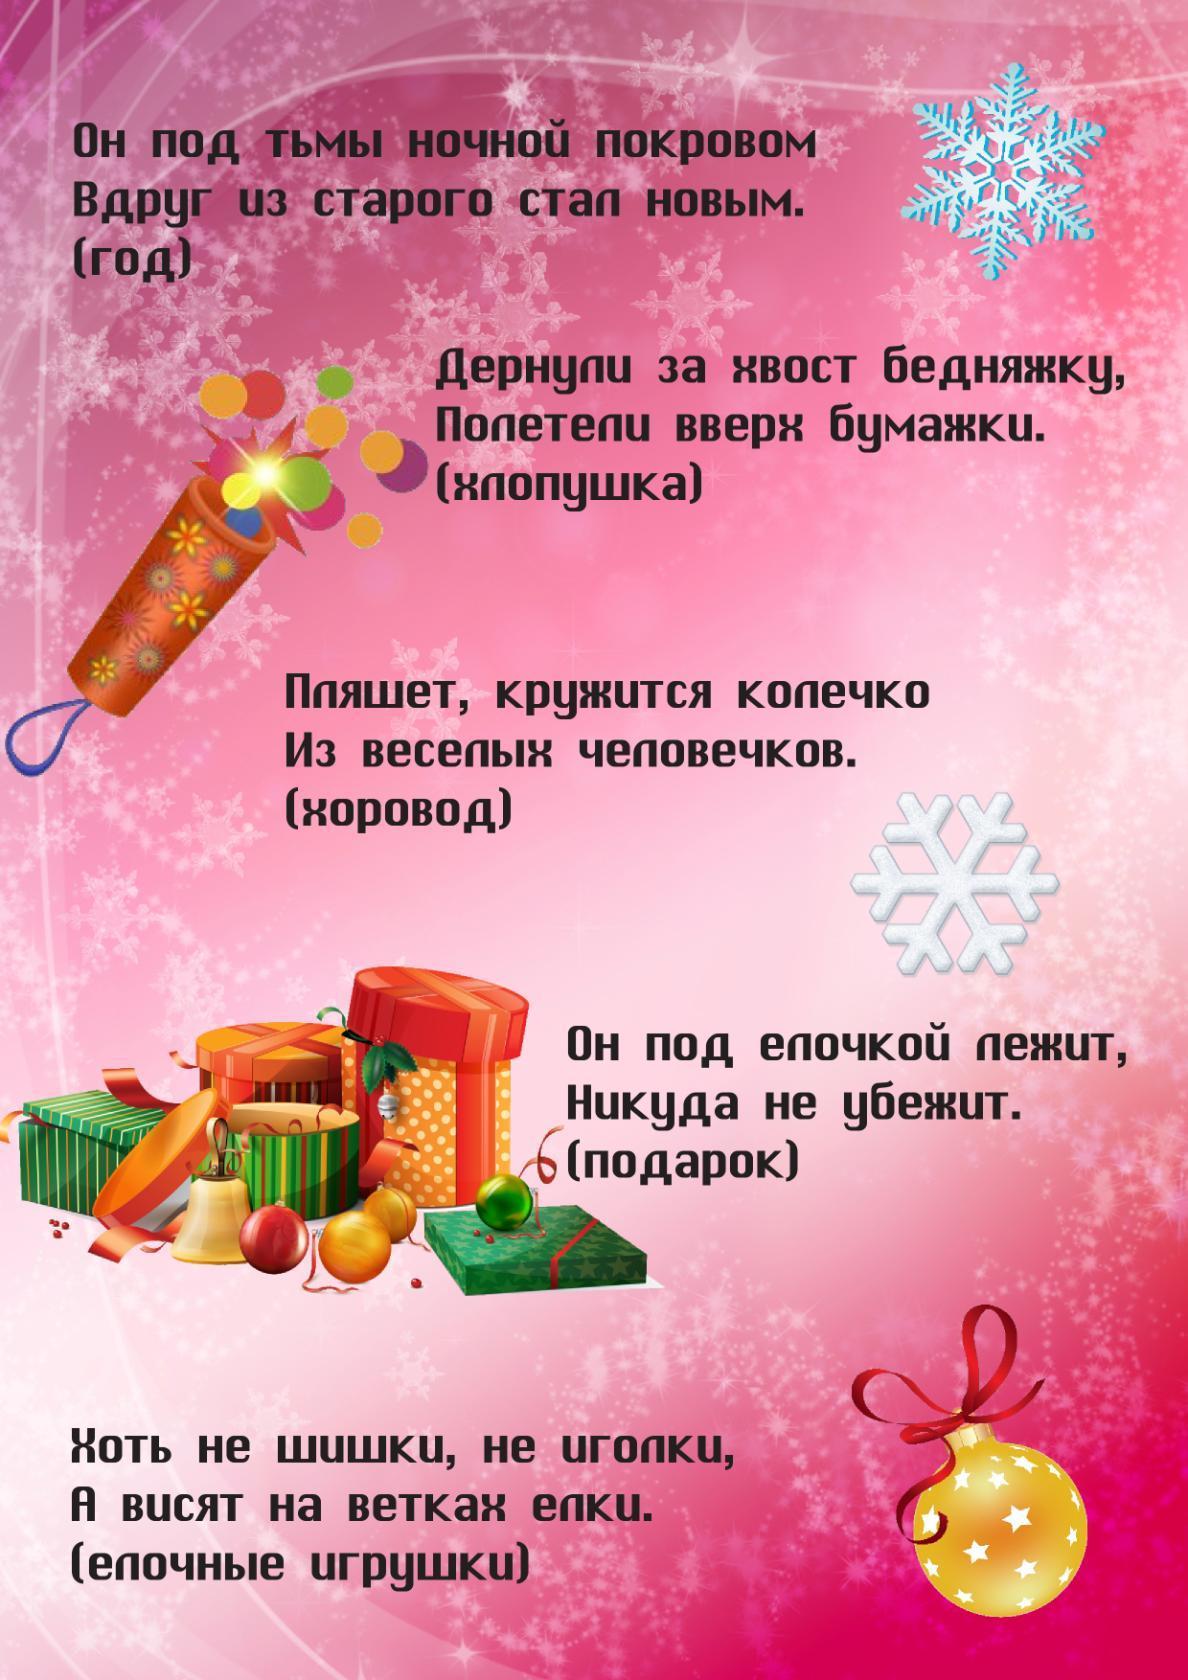 http://s3.uploads.ru/AnOkq.jpg